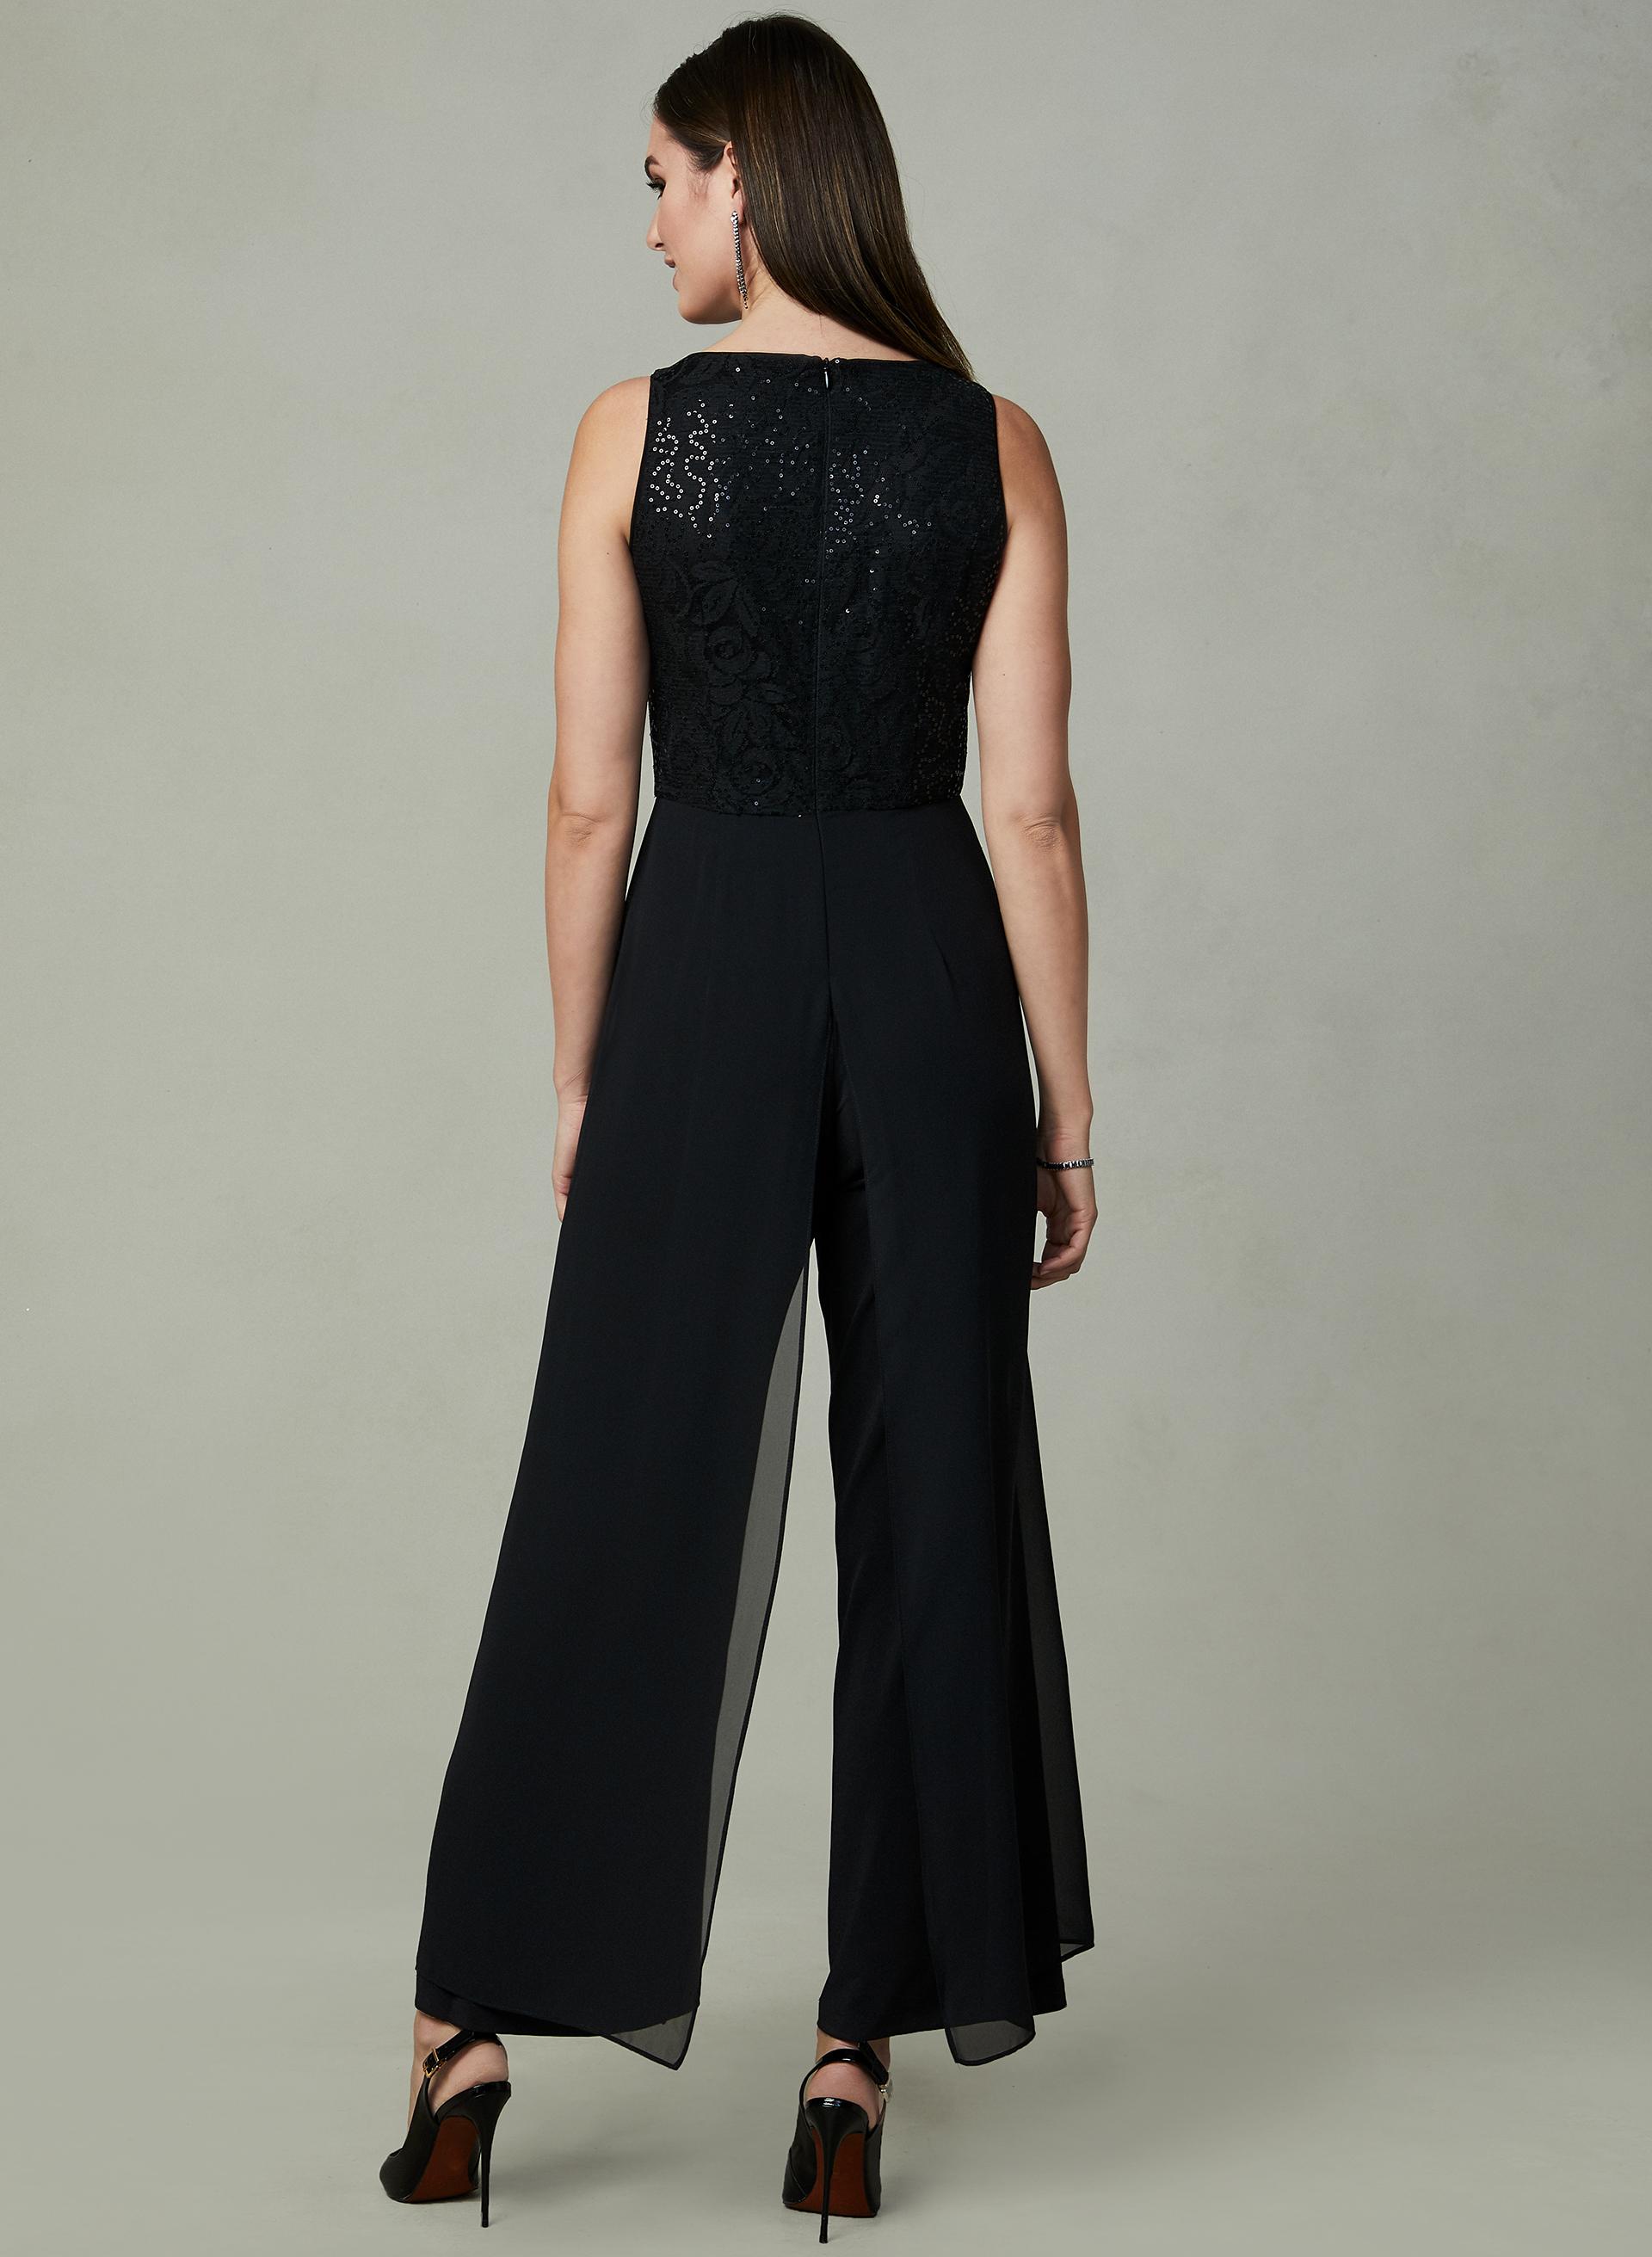 671ecfccb1 ... Maggy London - Sequin Lace Jumpsuit